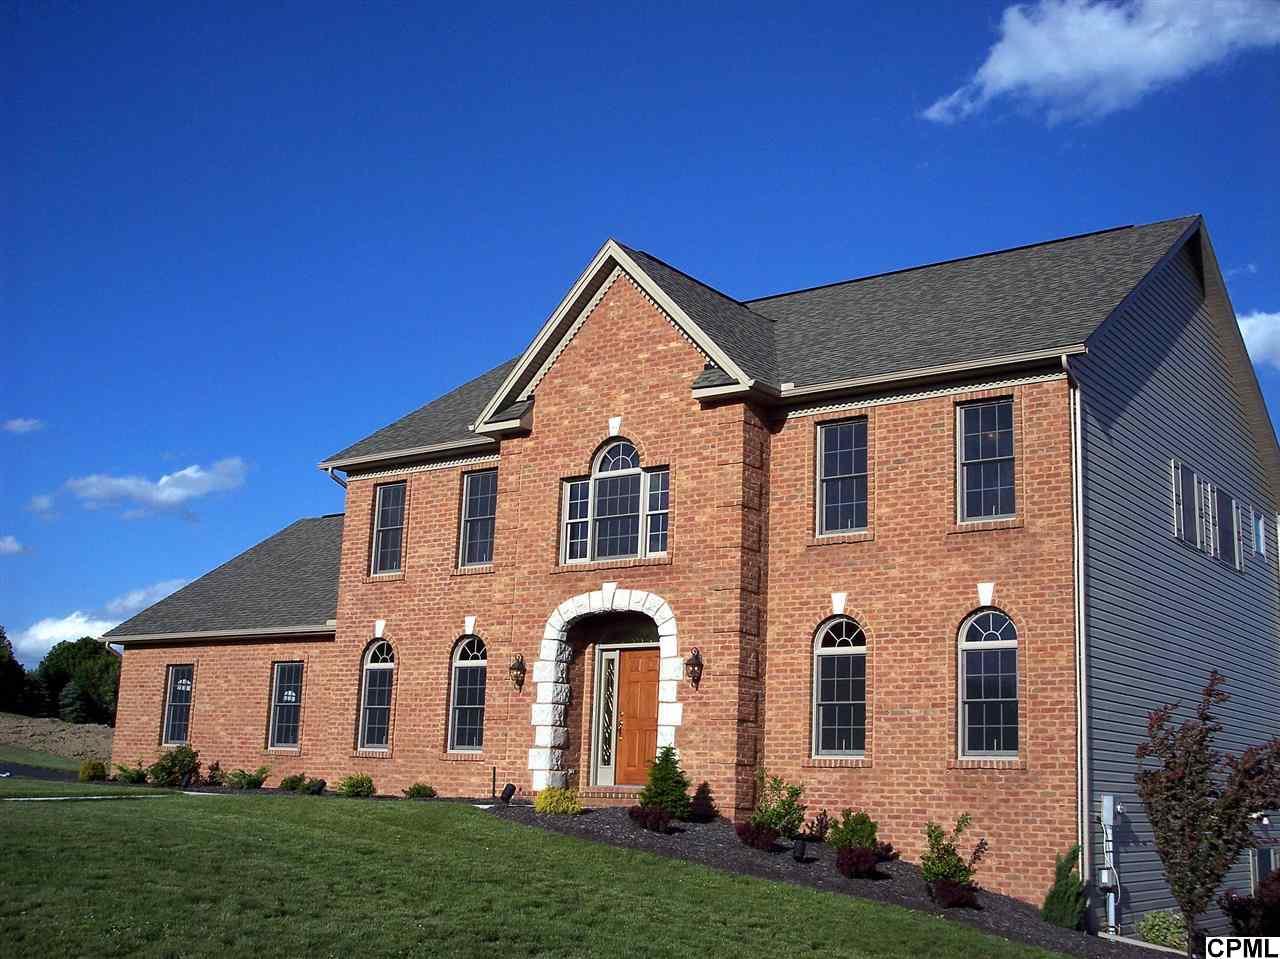 Rental Homes for Rent, ListingId:30301991, location: 6302 Aston Court Harrisburg 17111